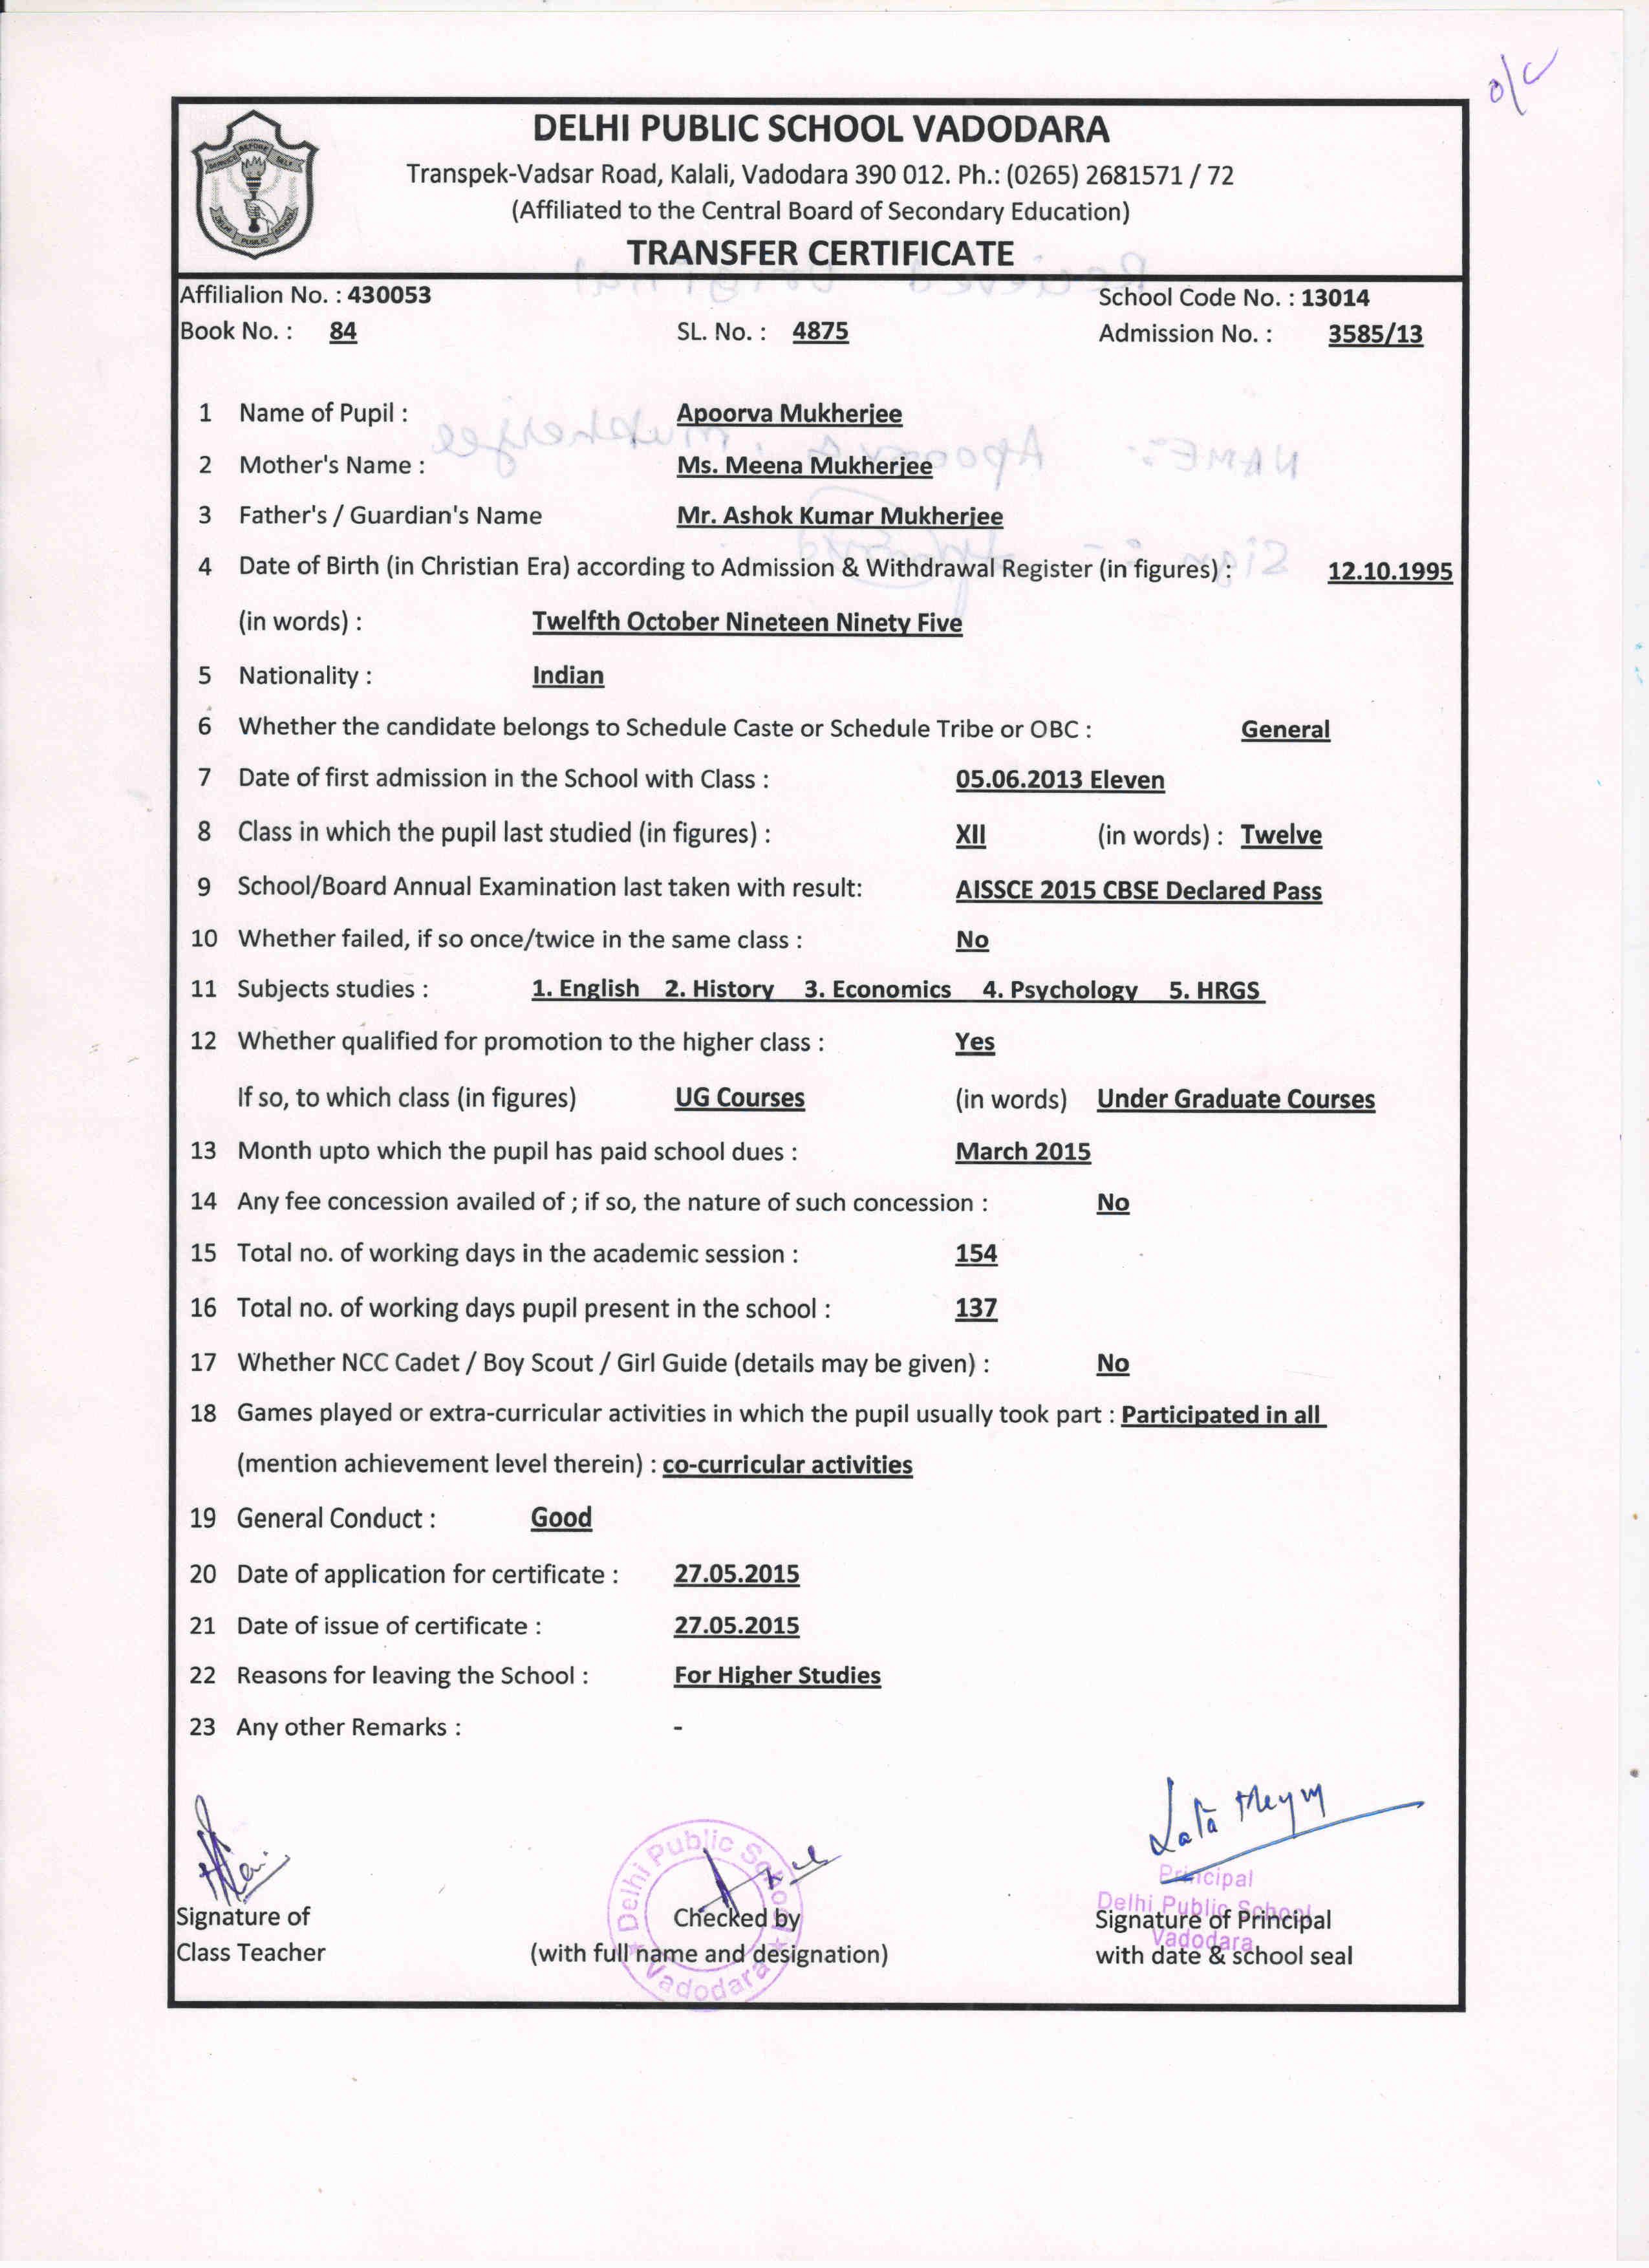 Dps vadodara issued transfer certificate 6 4875 apoorva mukherjee view xflitez Image collections